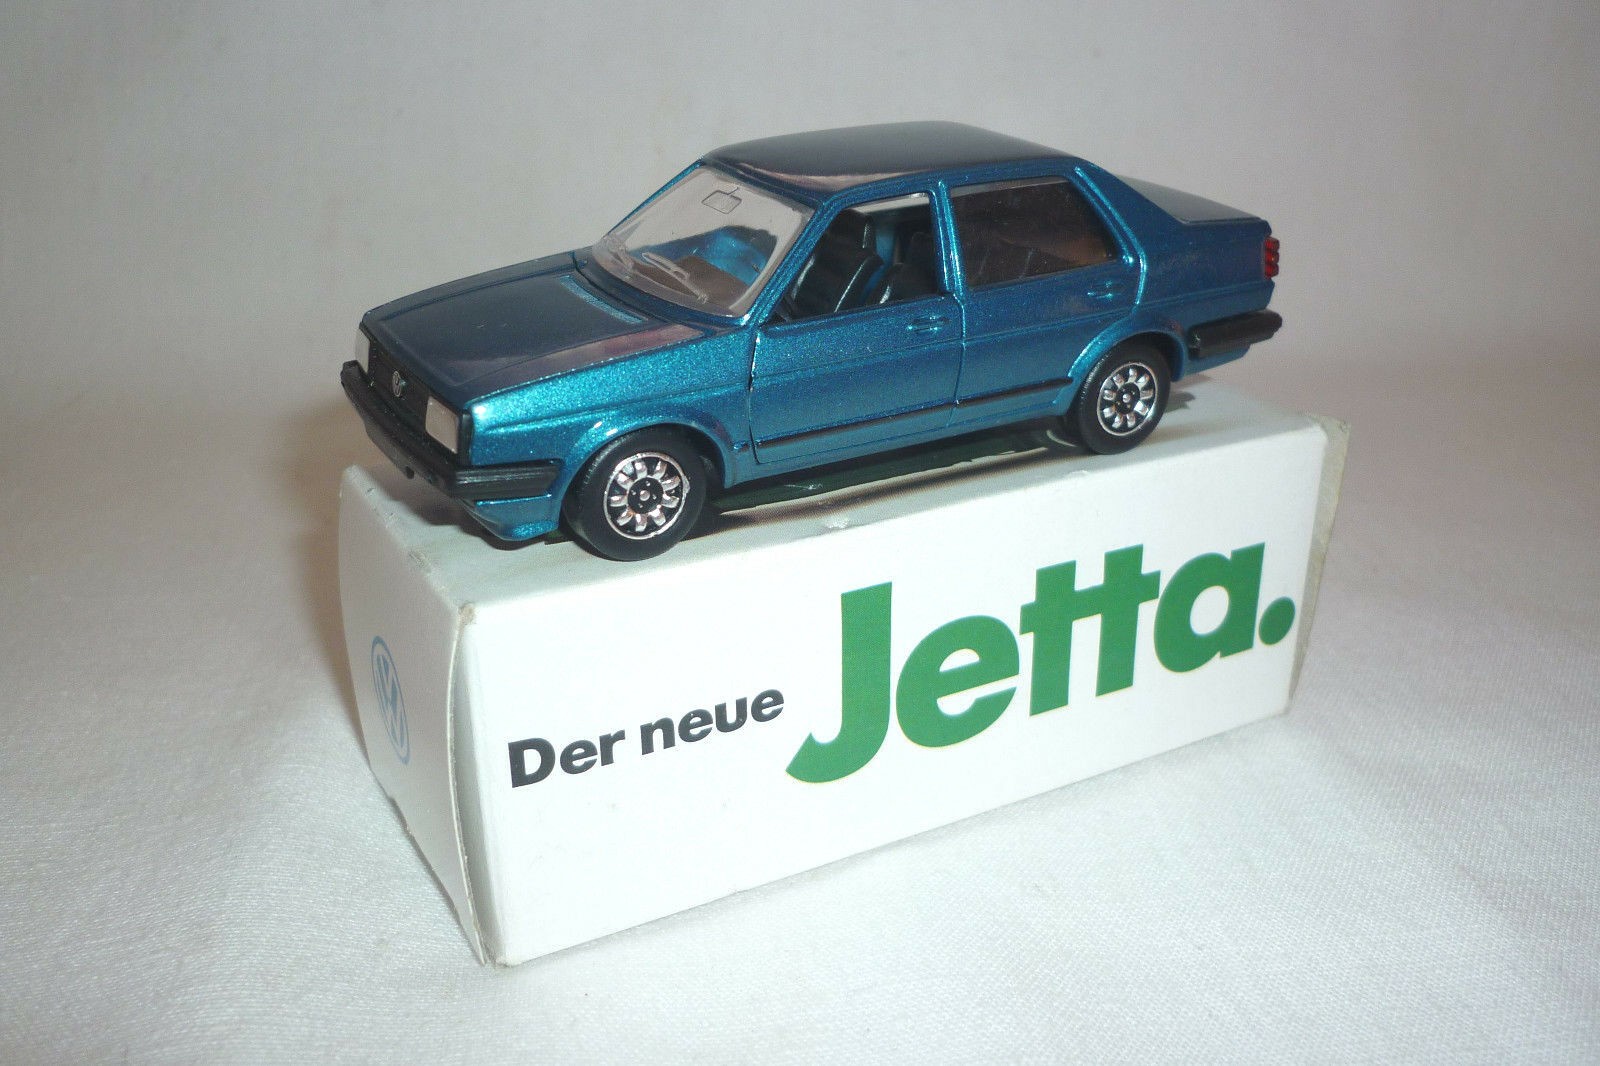 Schabak-modello-VOLKSWAGEN JETTA - 1:43 - OVP - (3.div-22)